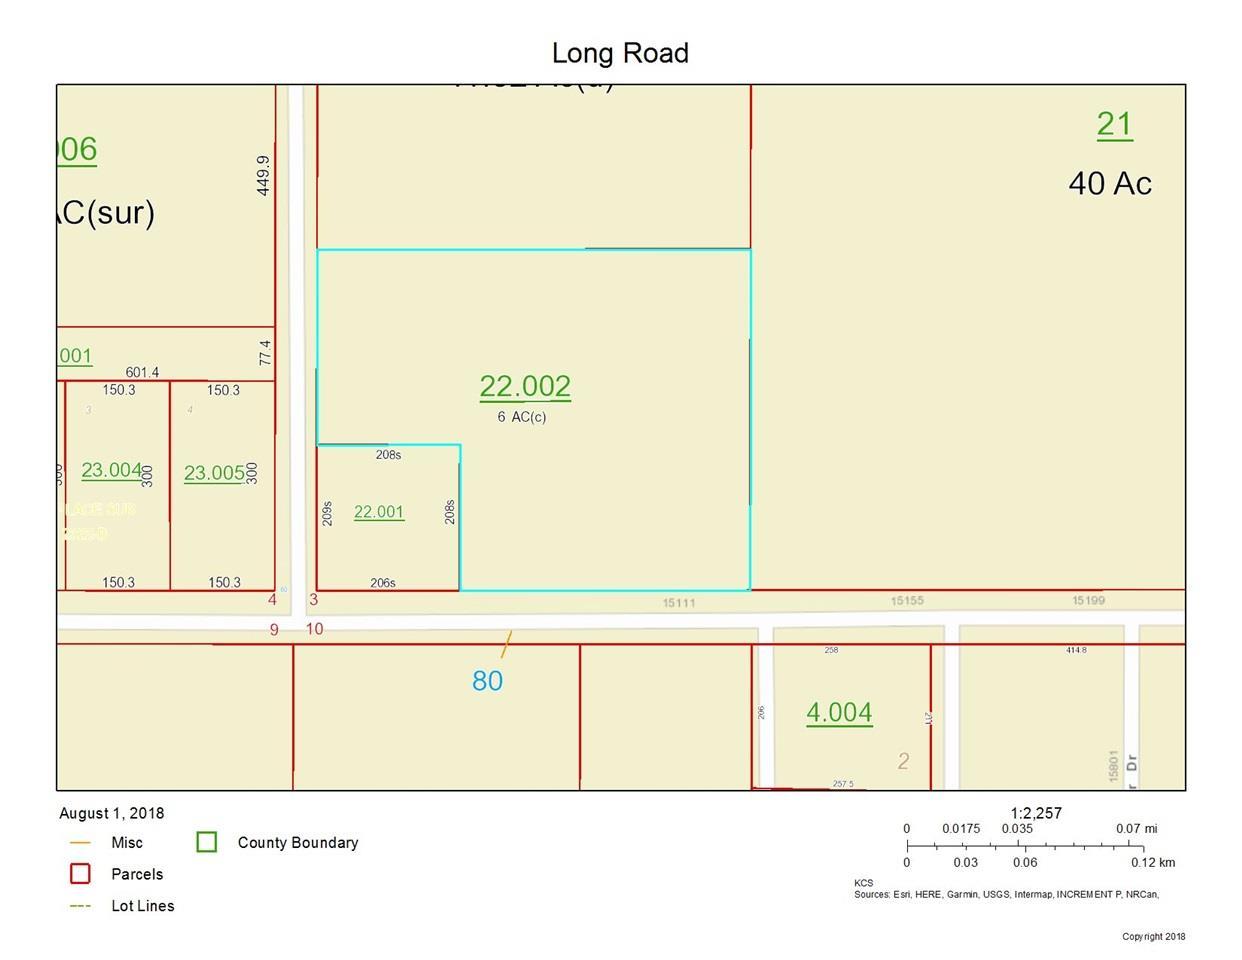 2 Long Rd, Summerdale, AL 36580